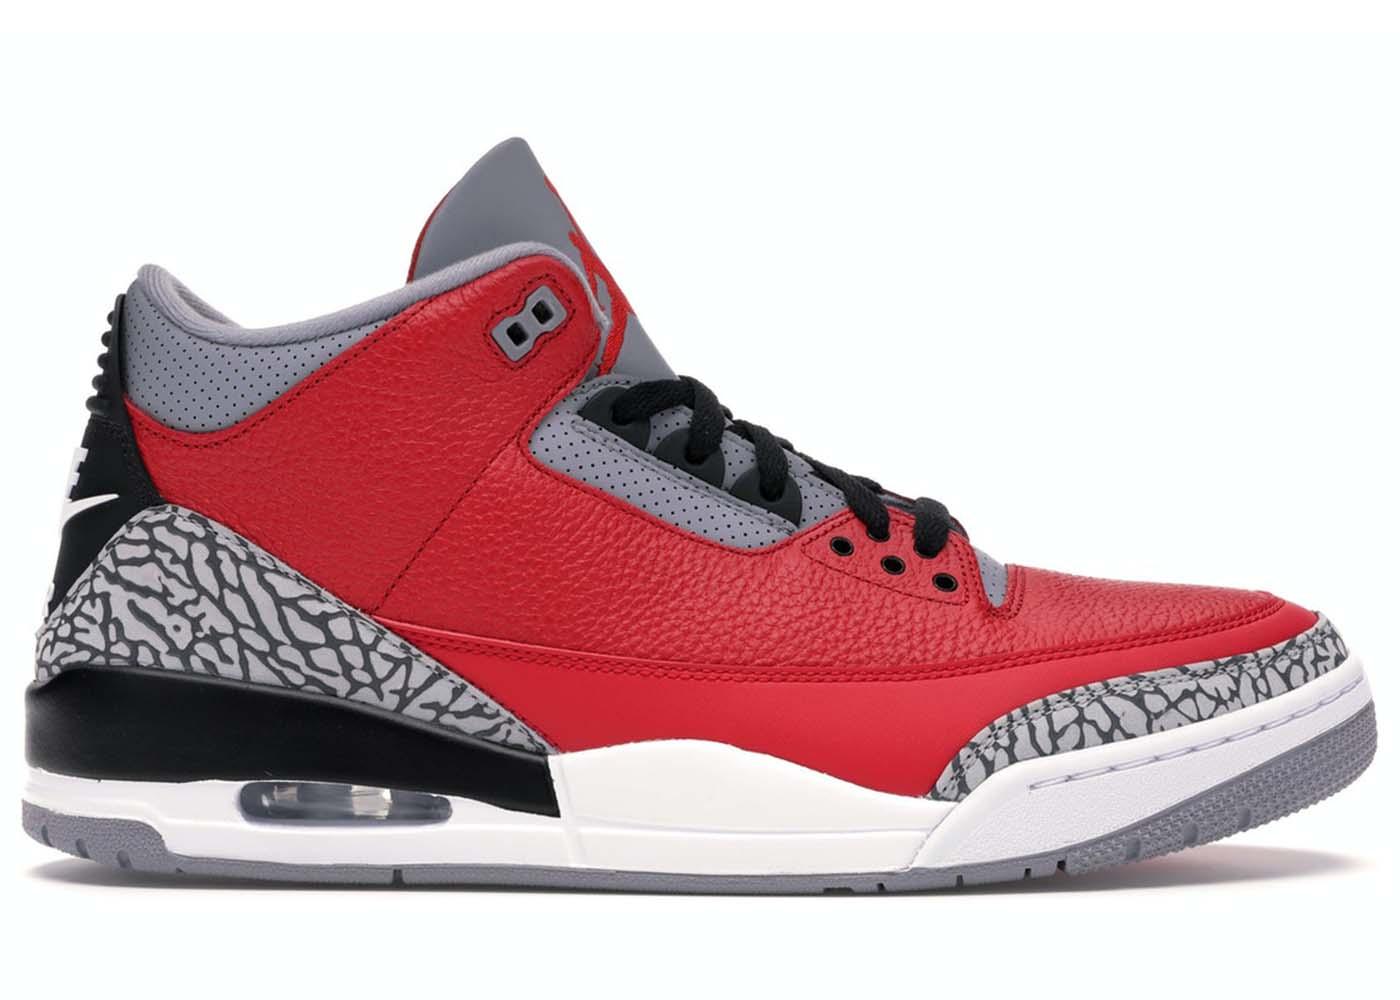 Jordan 3 Retro SE Unite Fire Red - CK5692-600